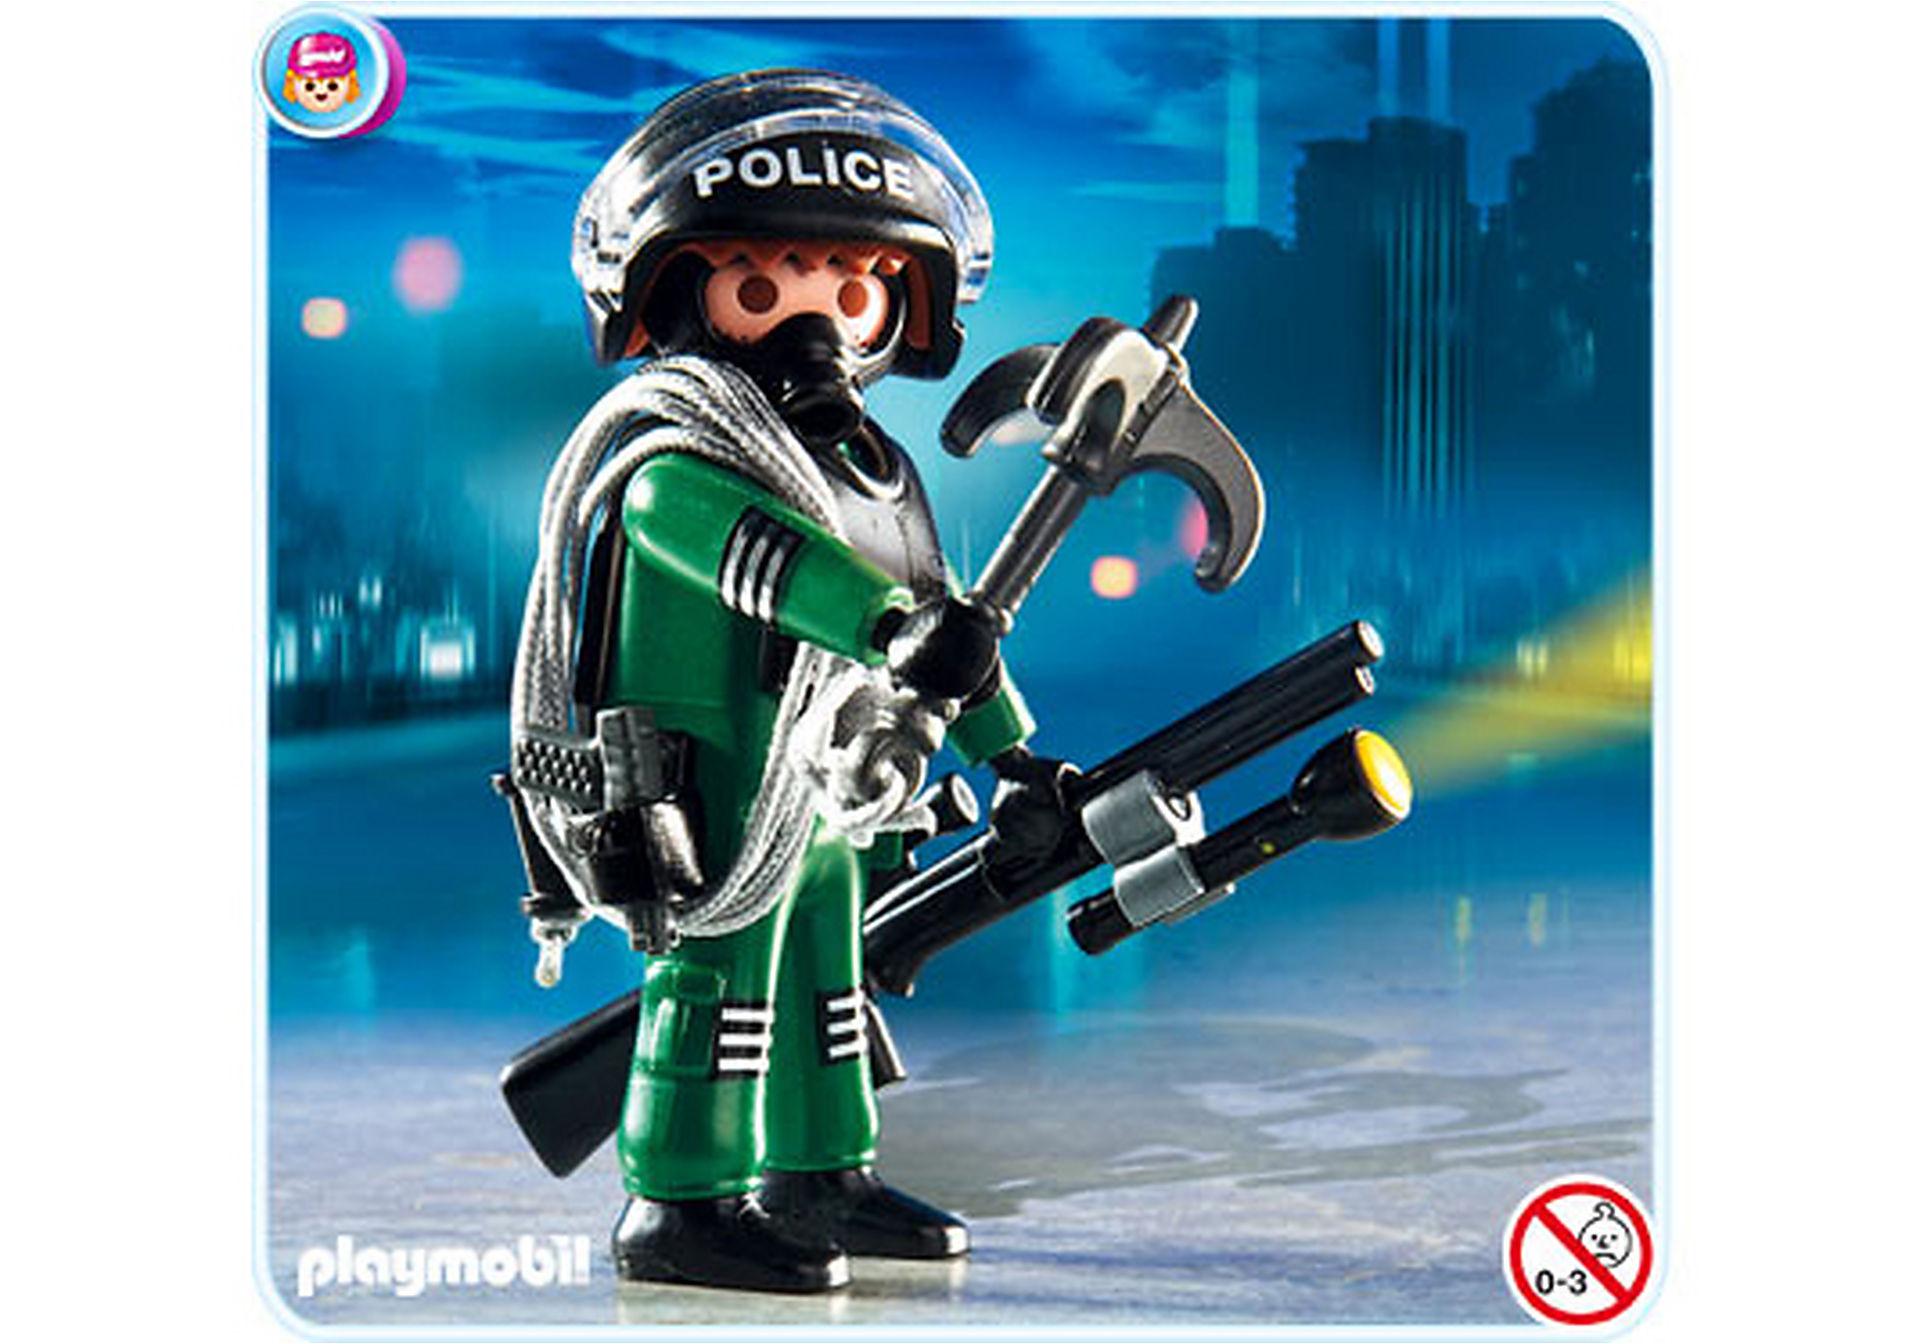 http://media.playmobil.com/i/playmobil/4693-A_product_detail/Polizei-Sondereinsatz